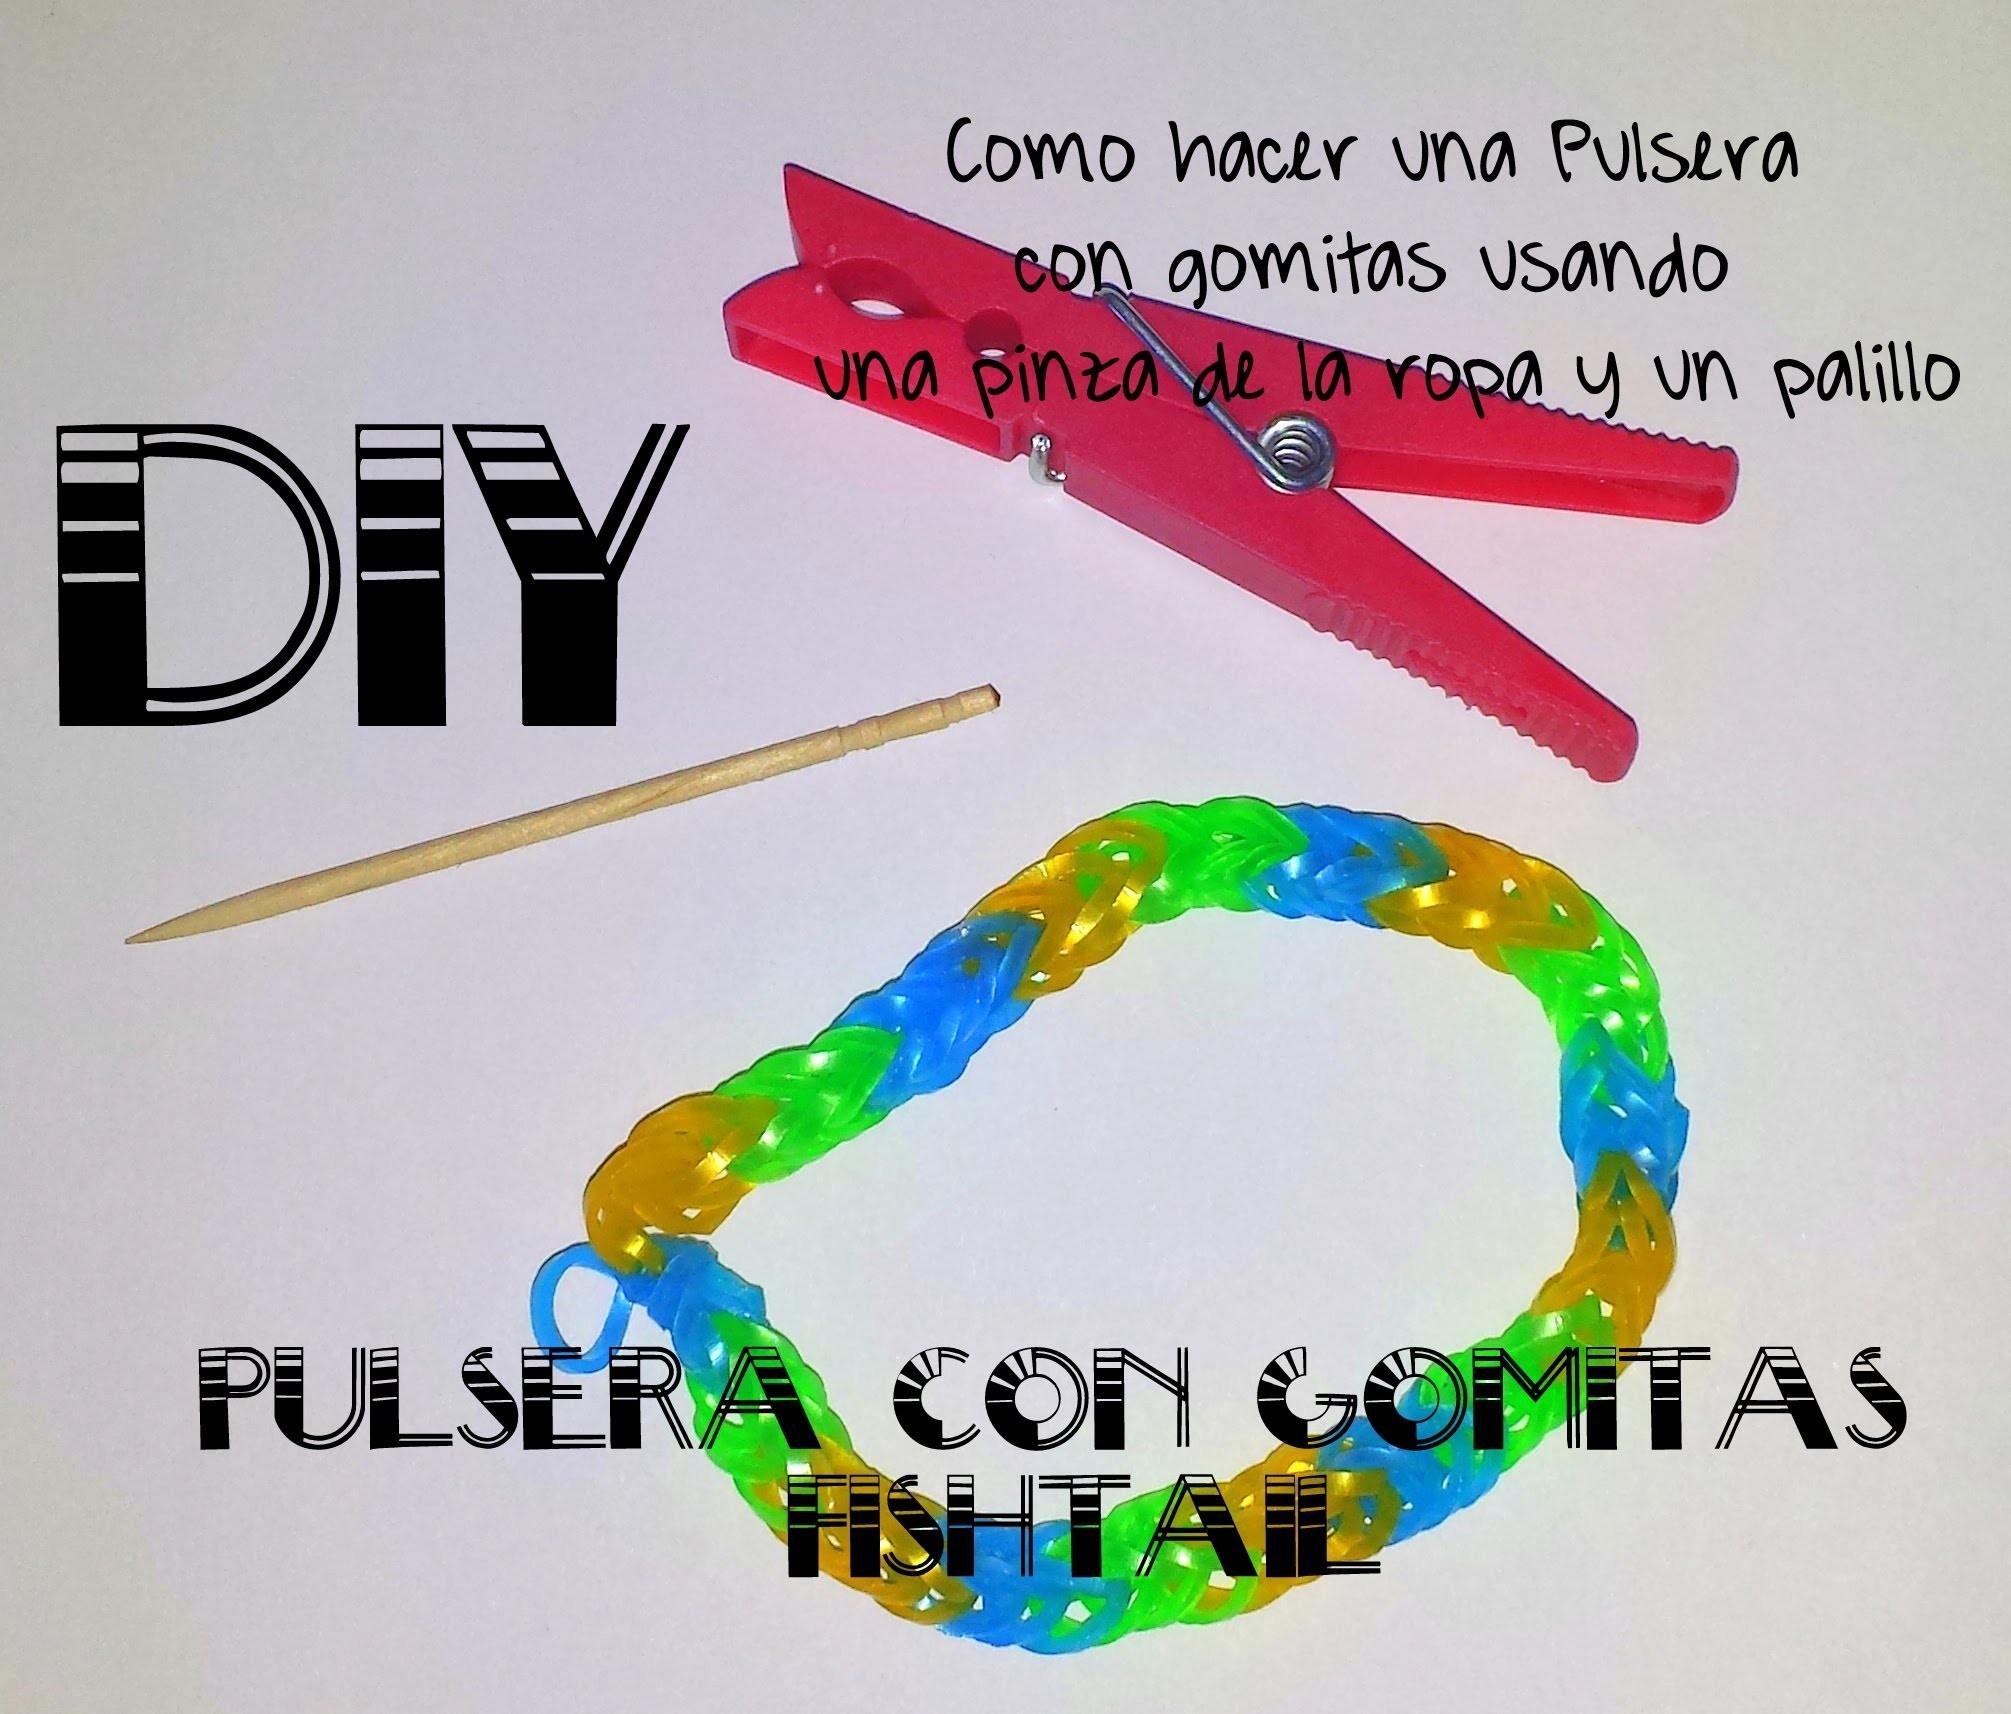 DIY: Pulsera Gomitas Fishtail Con pinza de tender